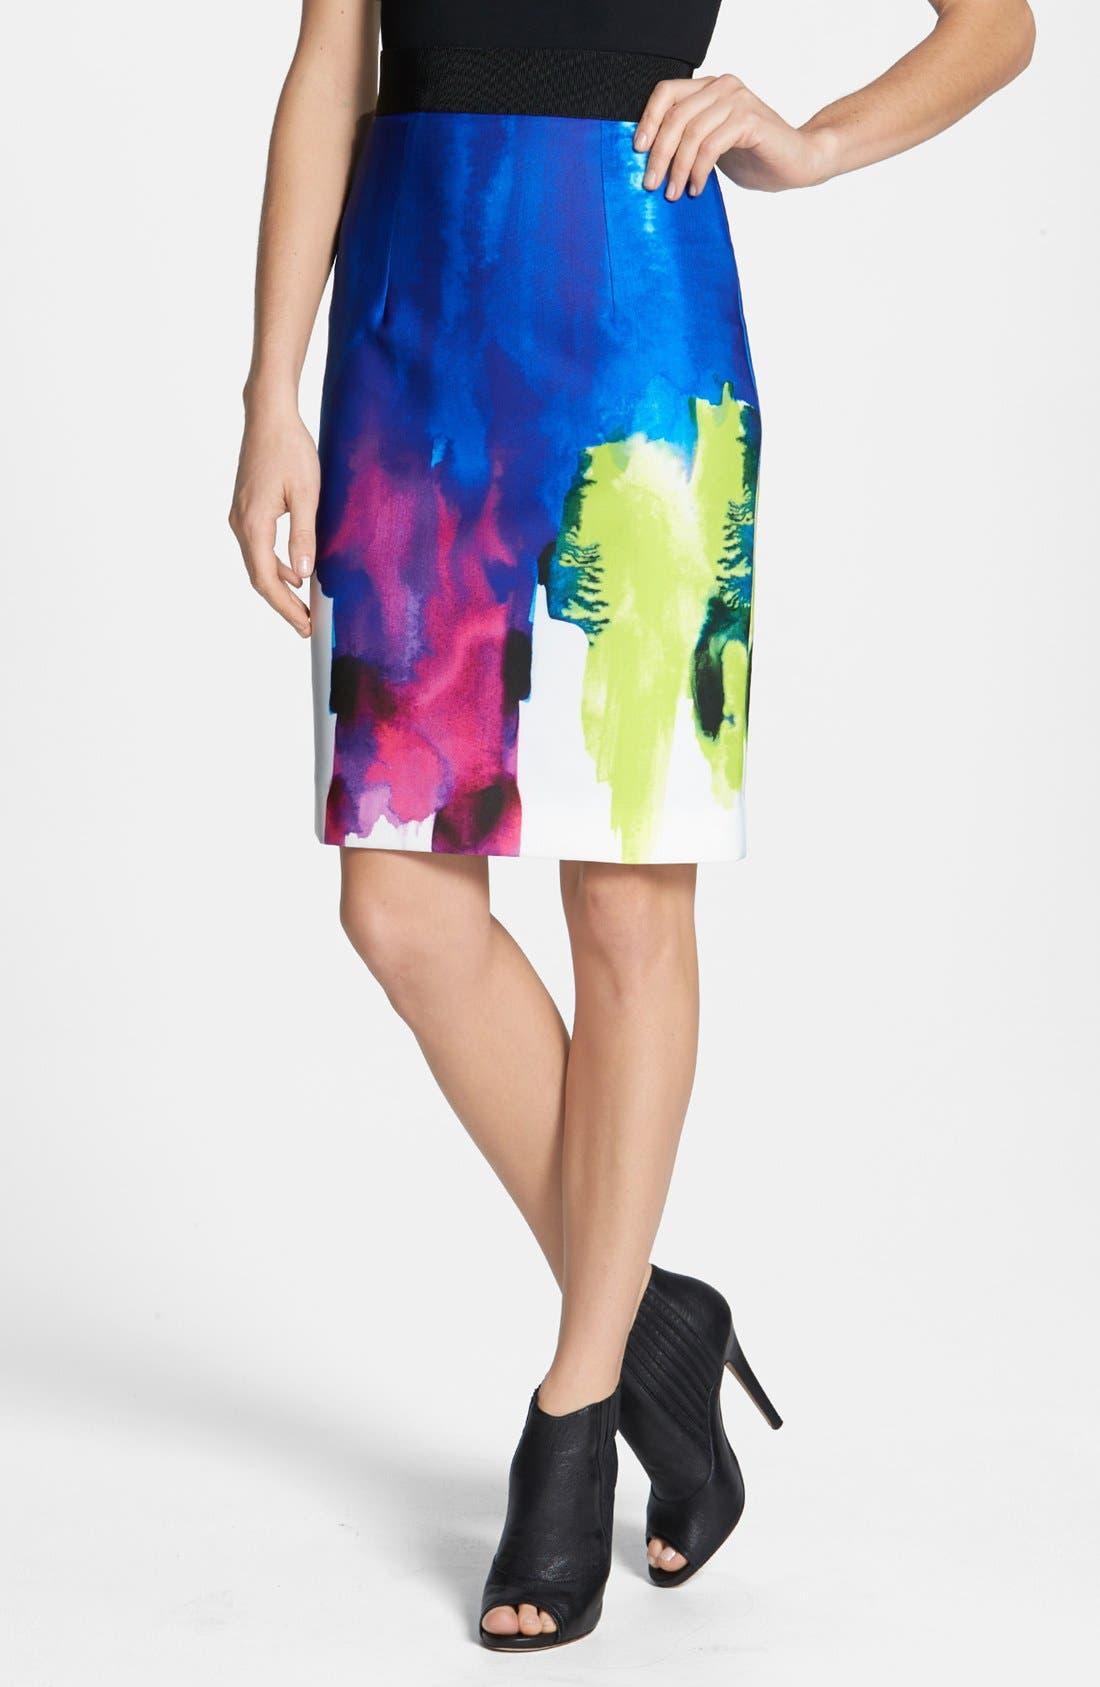 Main Image - Milly 'Italian Surf' Neoprene Pencil Skirt